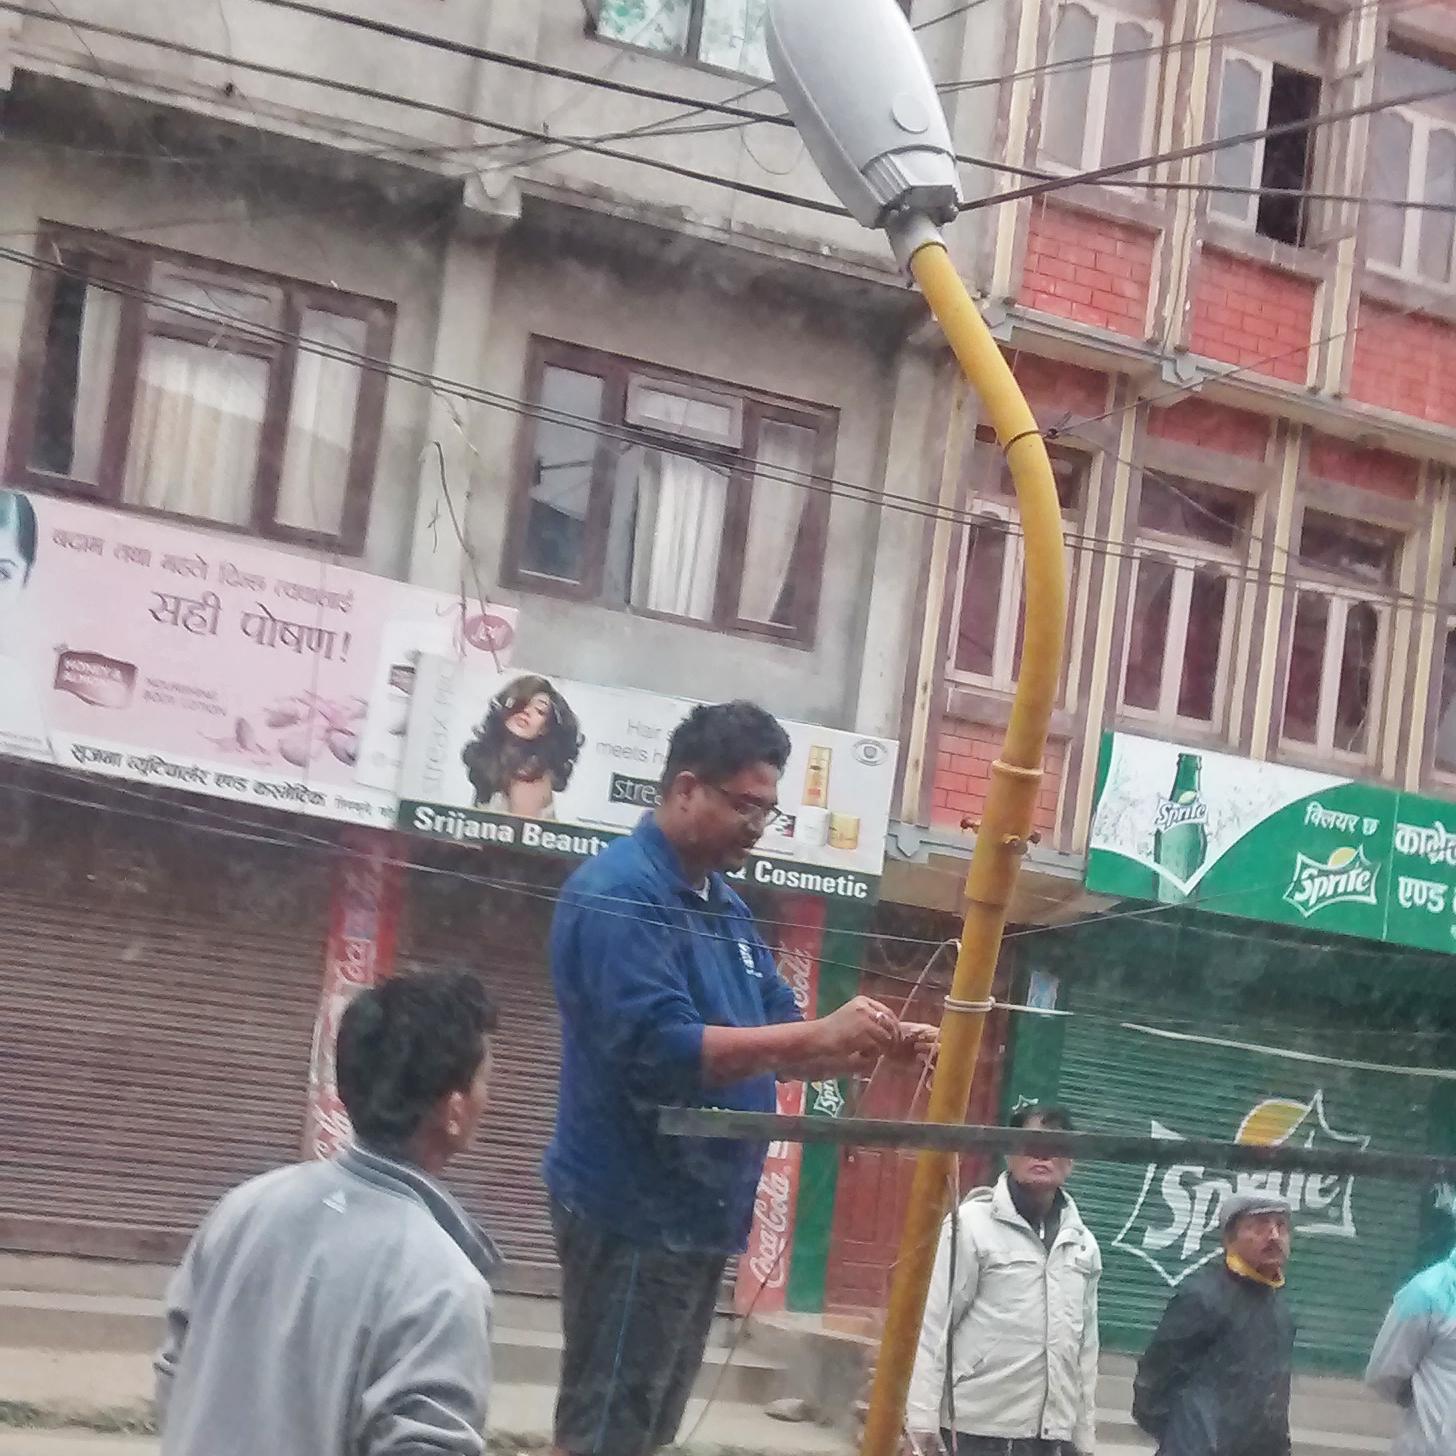 SunFarmer engineers Avi and Kushal fixing a solar lamp to give a Kathmandu street light after sundown